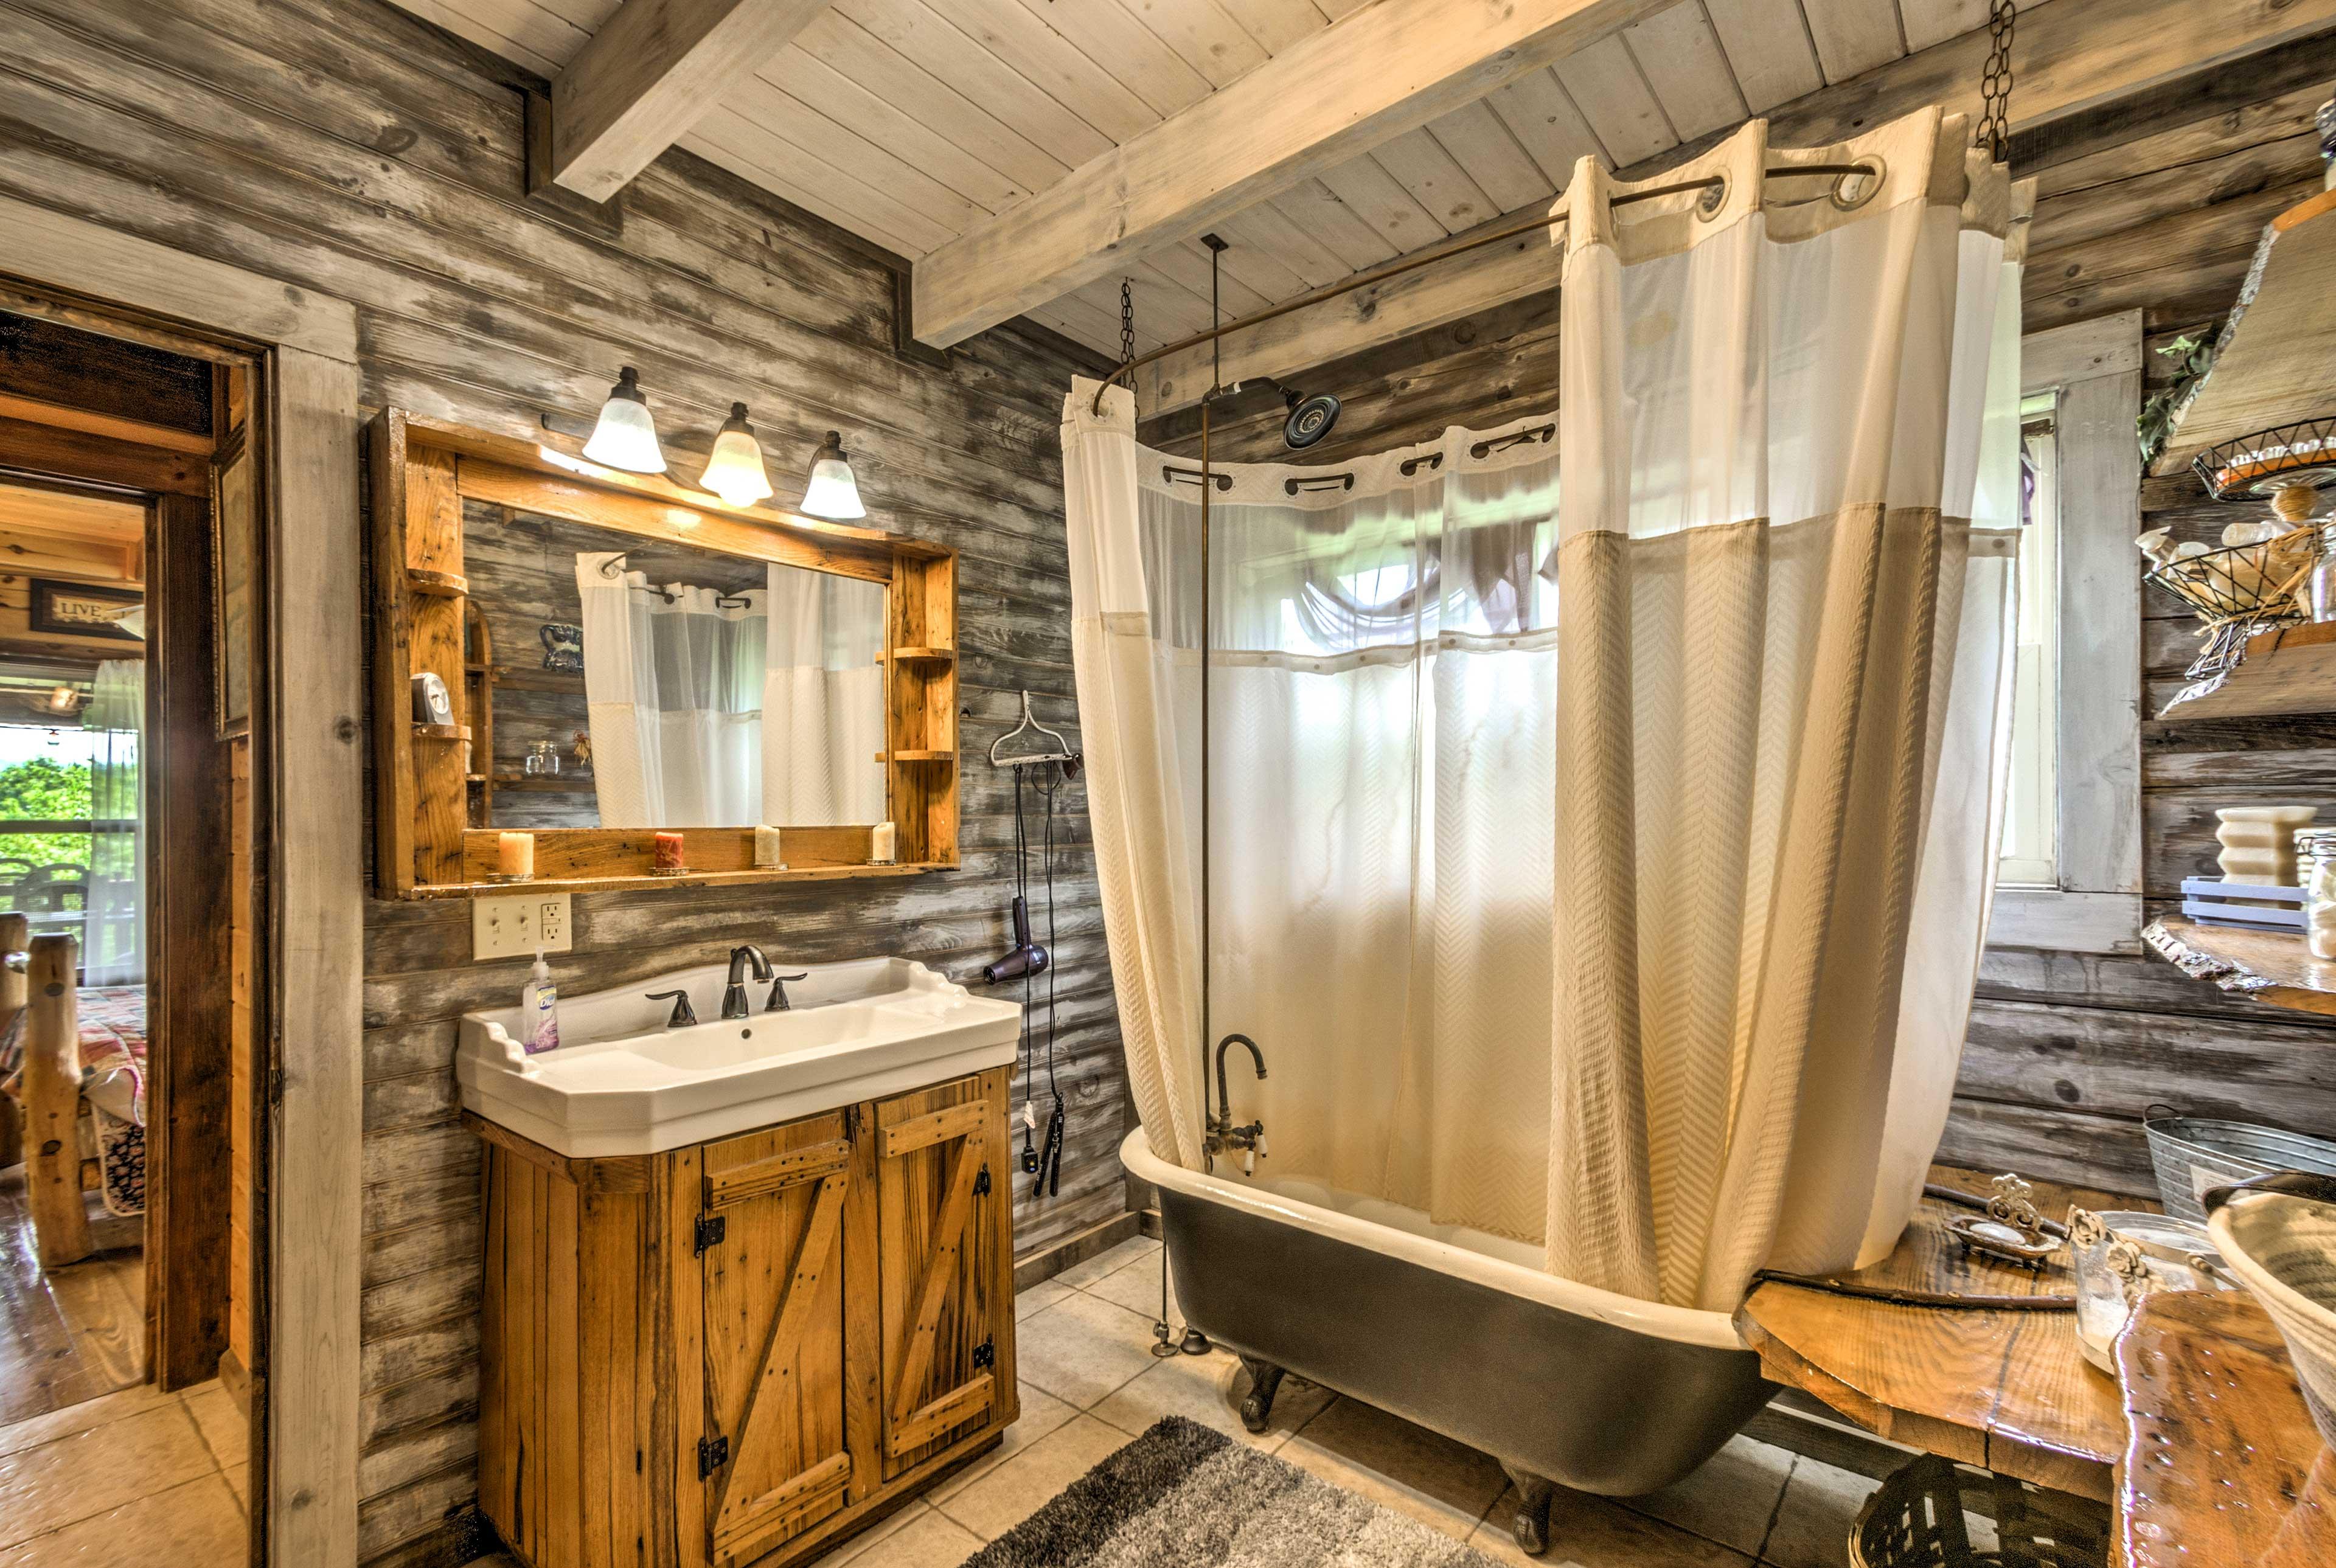 The en-suite bathroom offers a shower/tub combo.